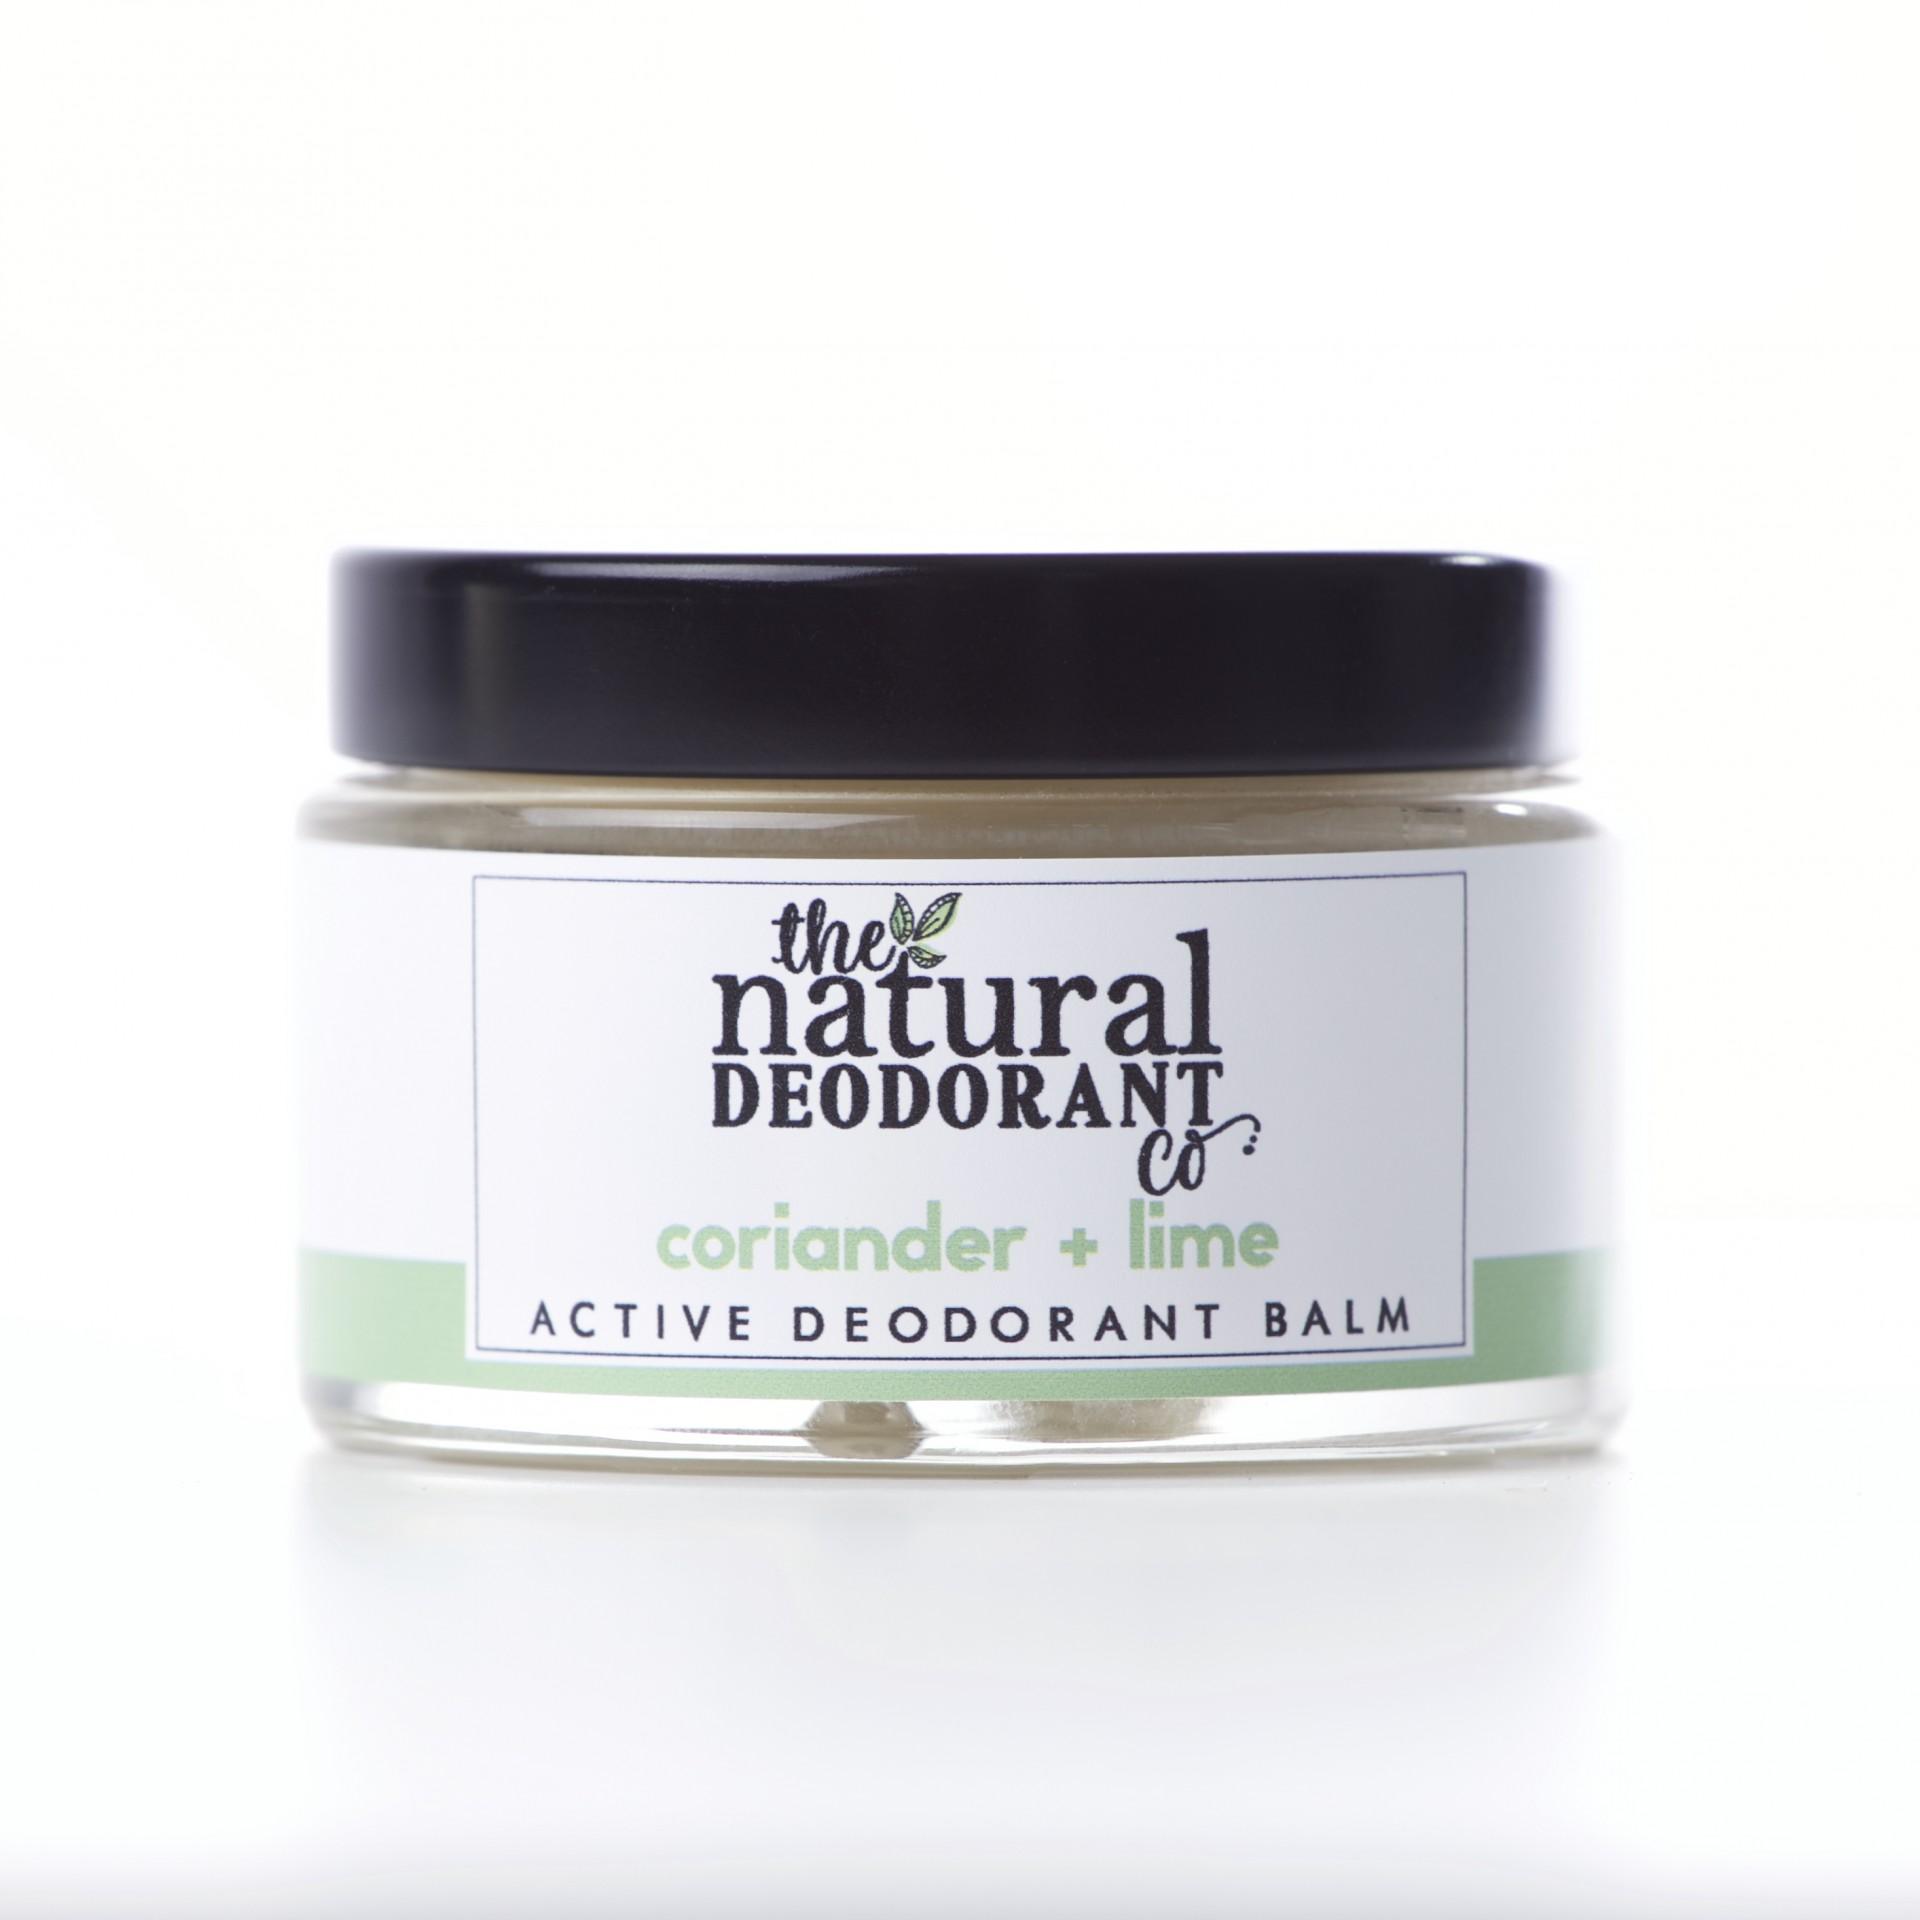 Desodorizante Natural Coentro + Lima - Active - The Natural Deodorant Co